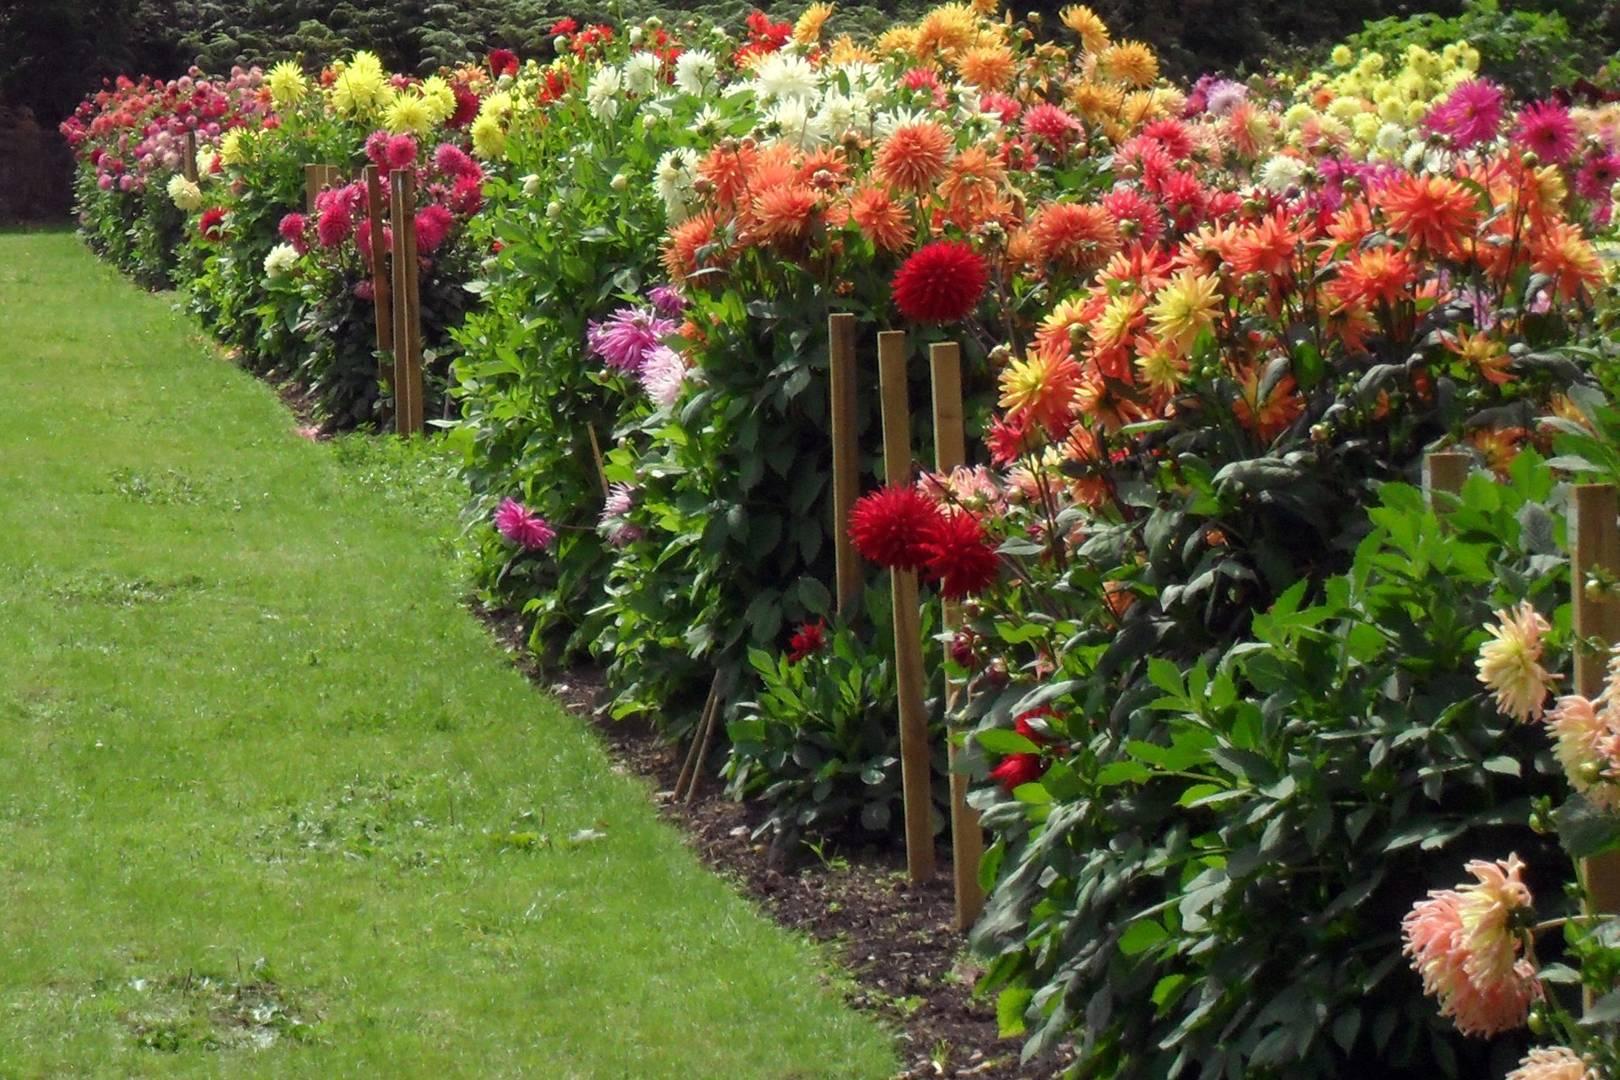 How To Plant And Grow Dahlia Rs House Garden